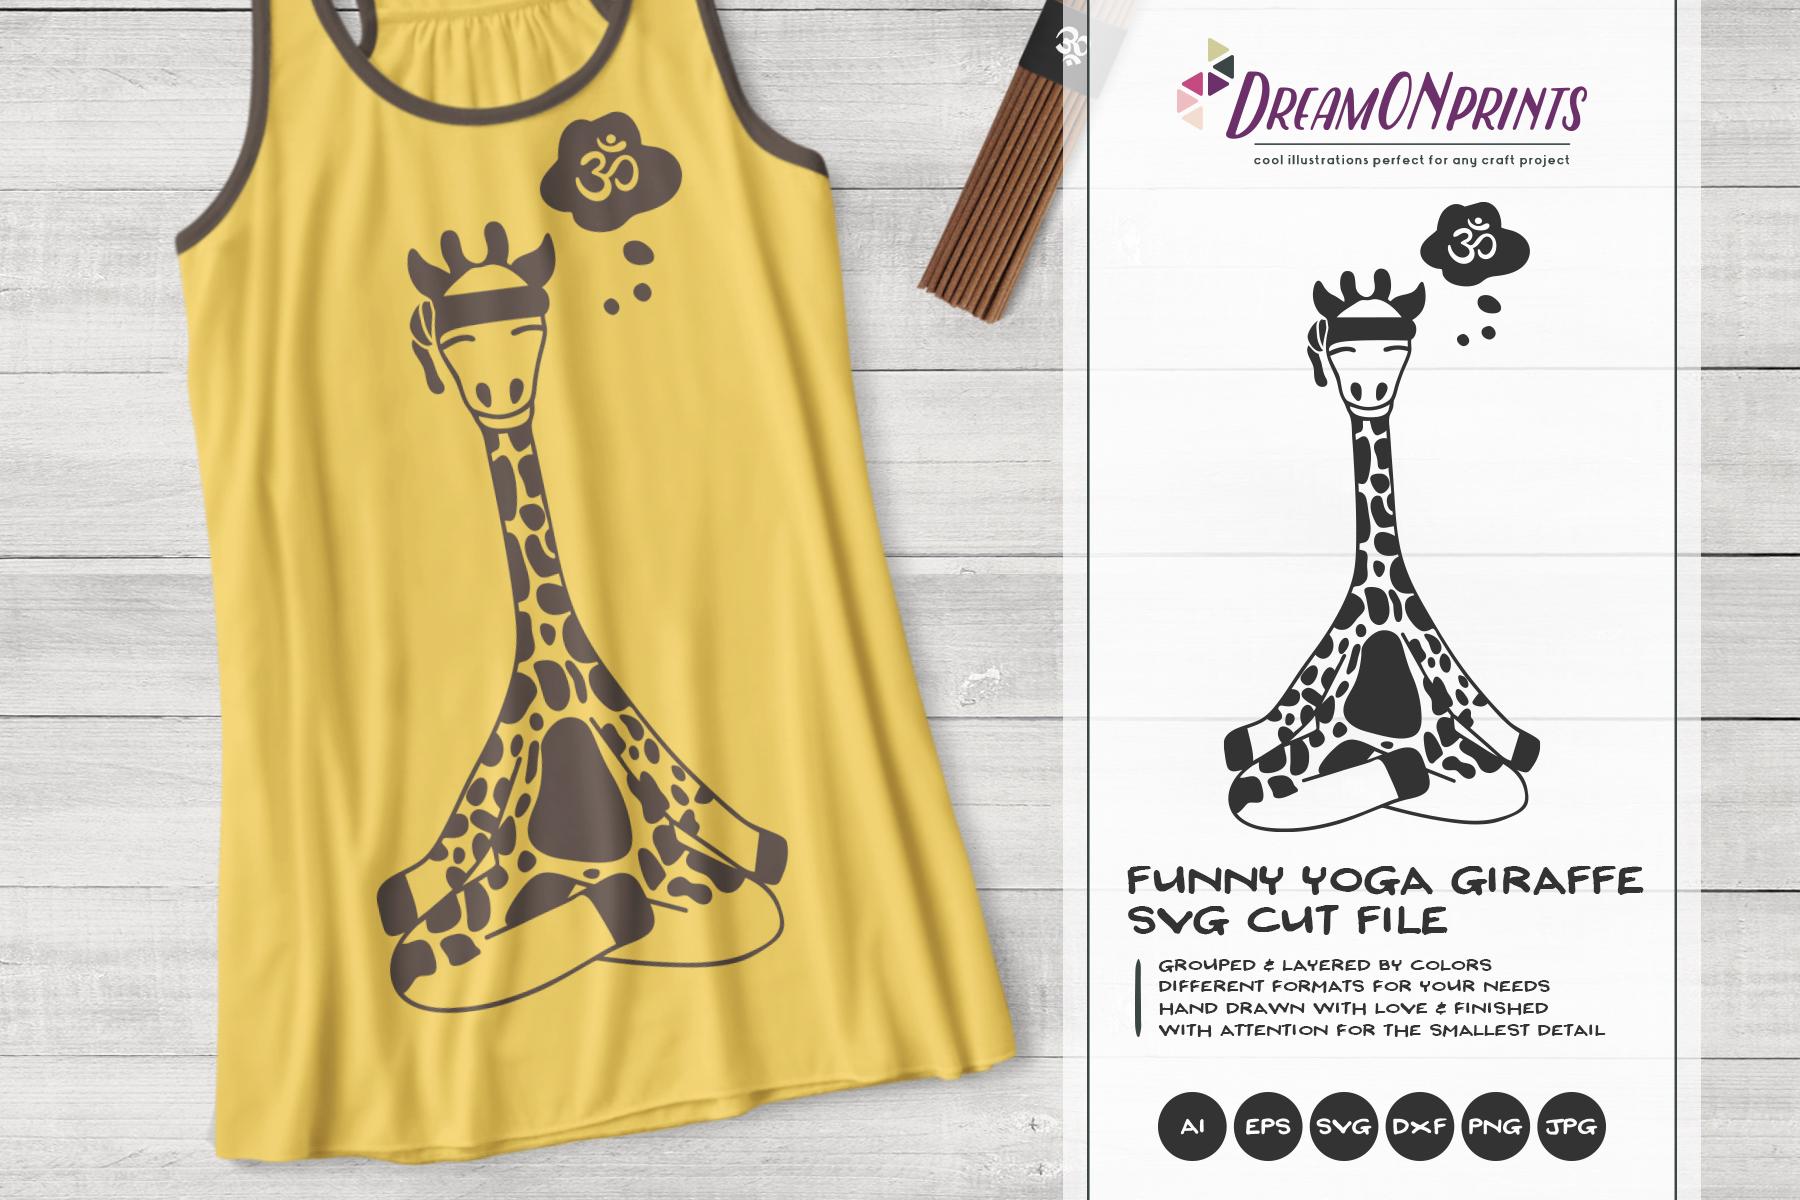 Yoga Giraffe SVG | Funny Giraffe SVG Vector example image 1